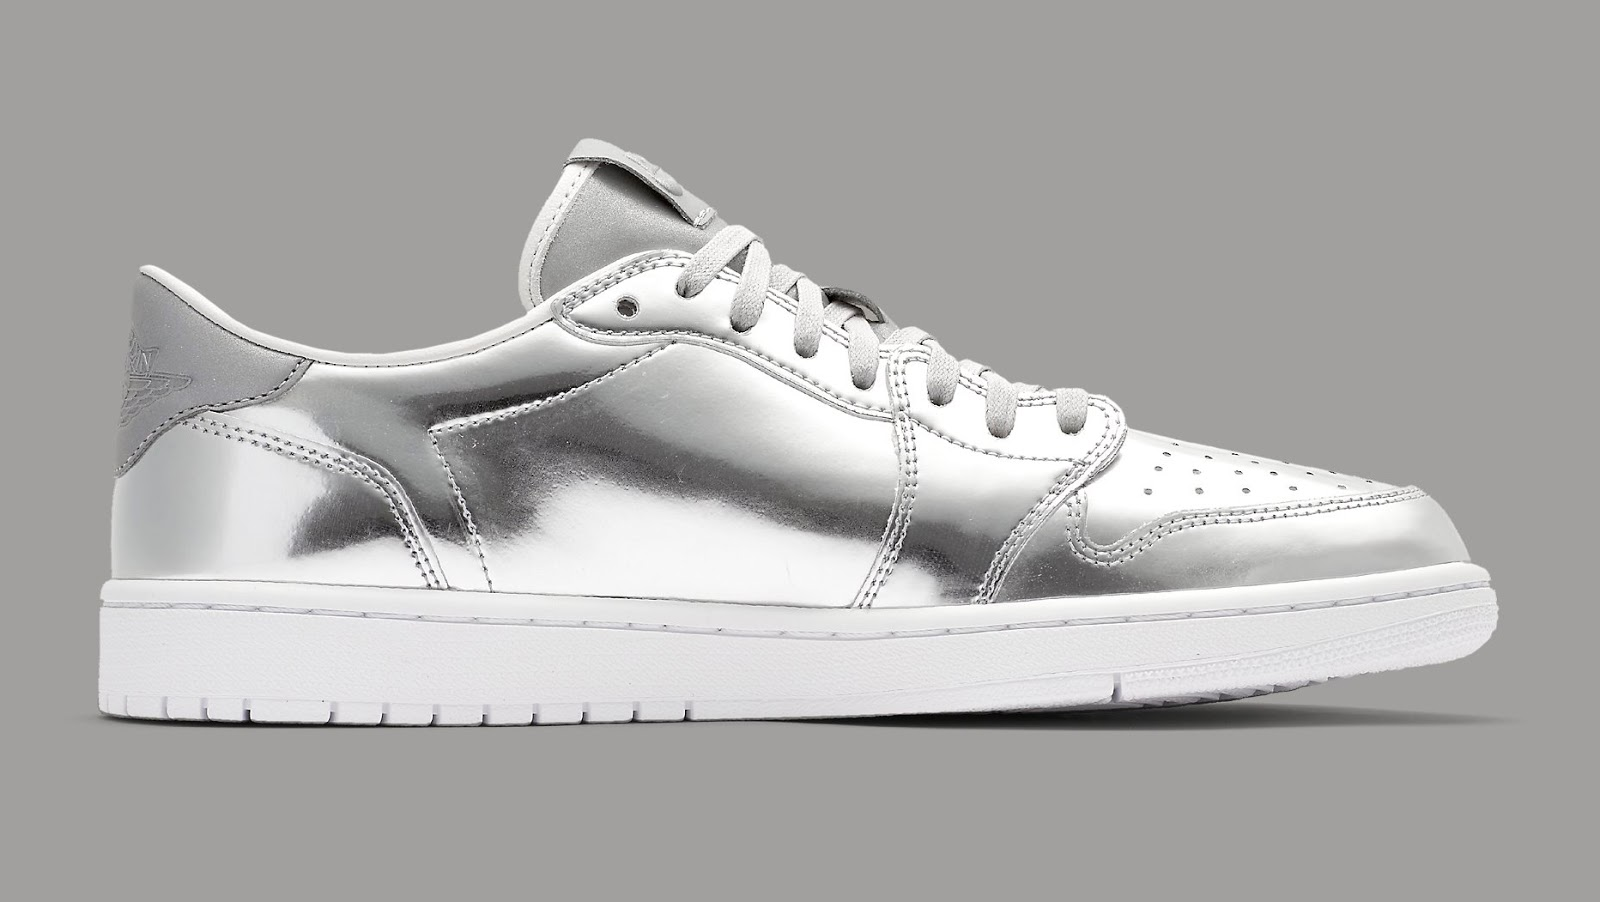 3d7913ccdd629b The gold Pinnacle Air Jordan 6 is a sneaker that will release alongside  similar metallic styles